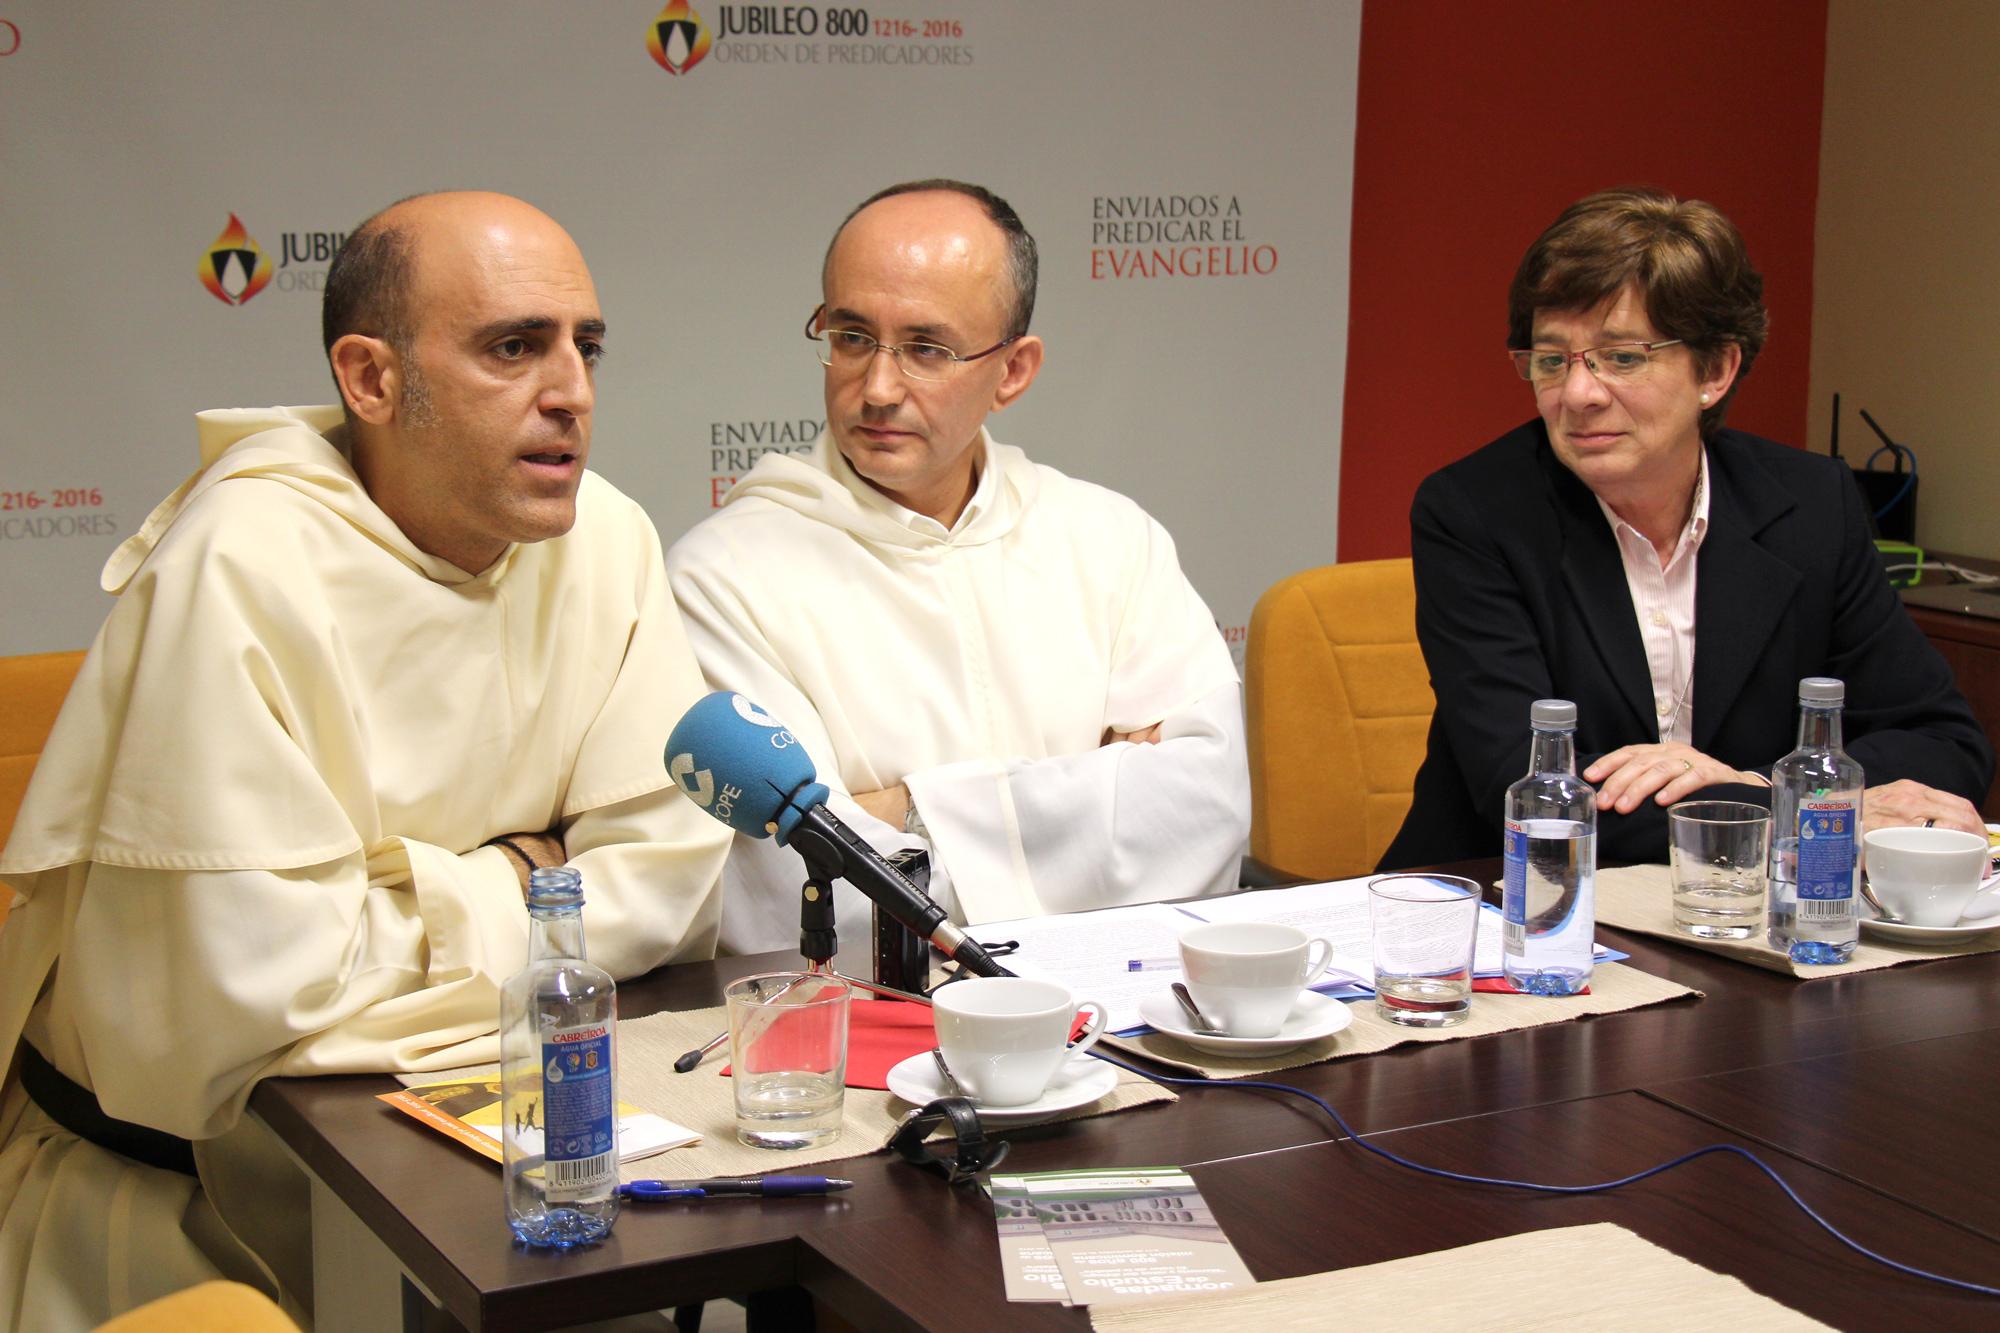 Presentation of the Dominican Jubilee in Spain